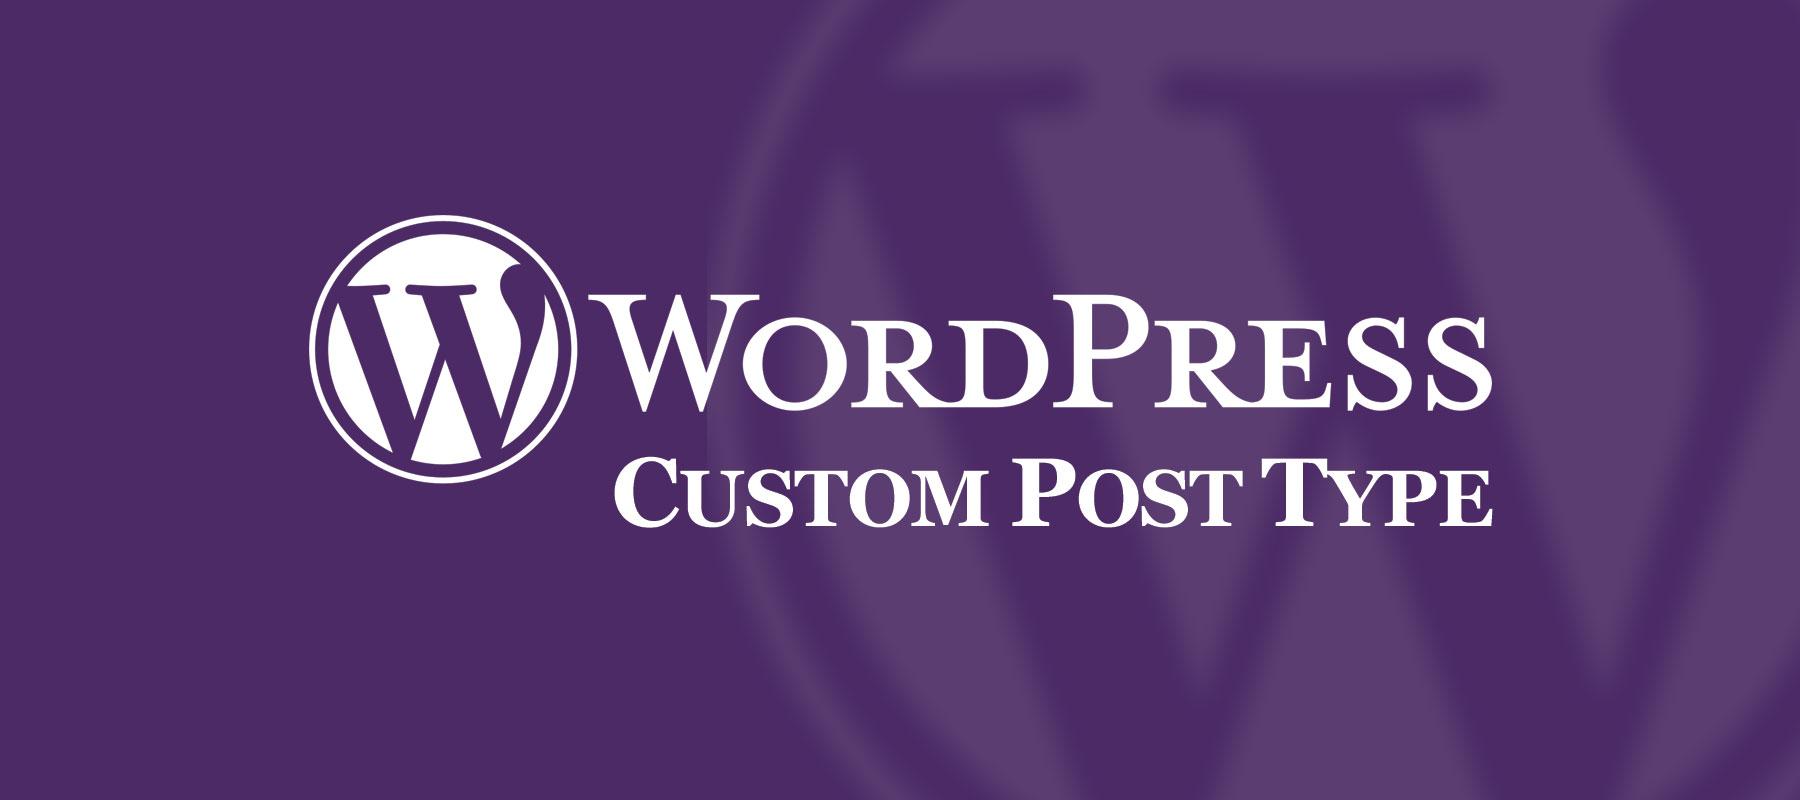 WordPress Custom Post Type